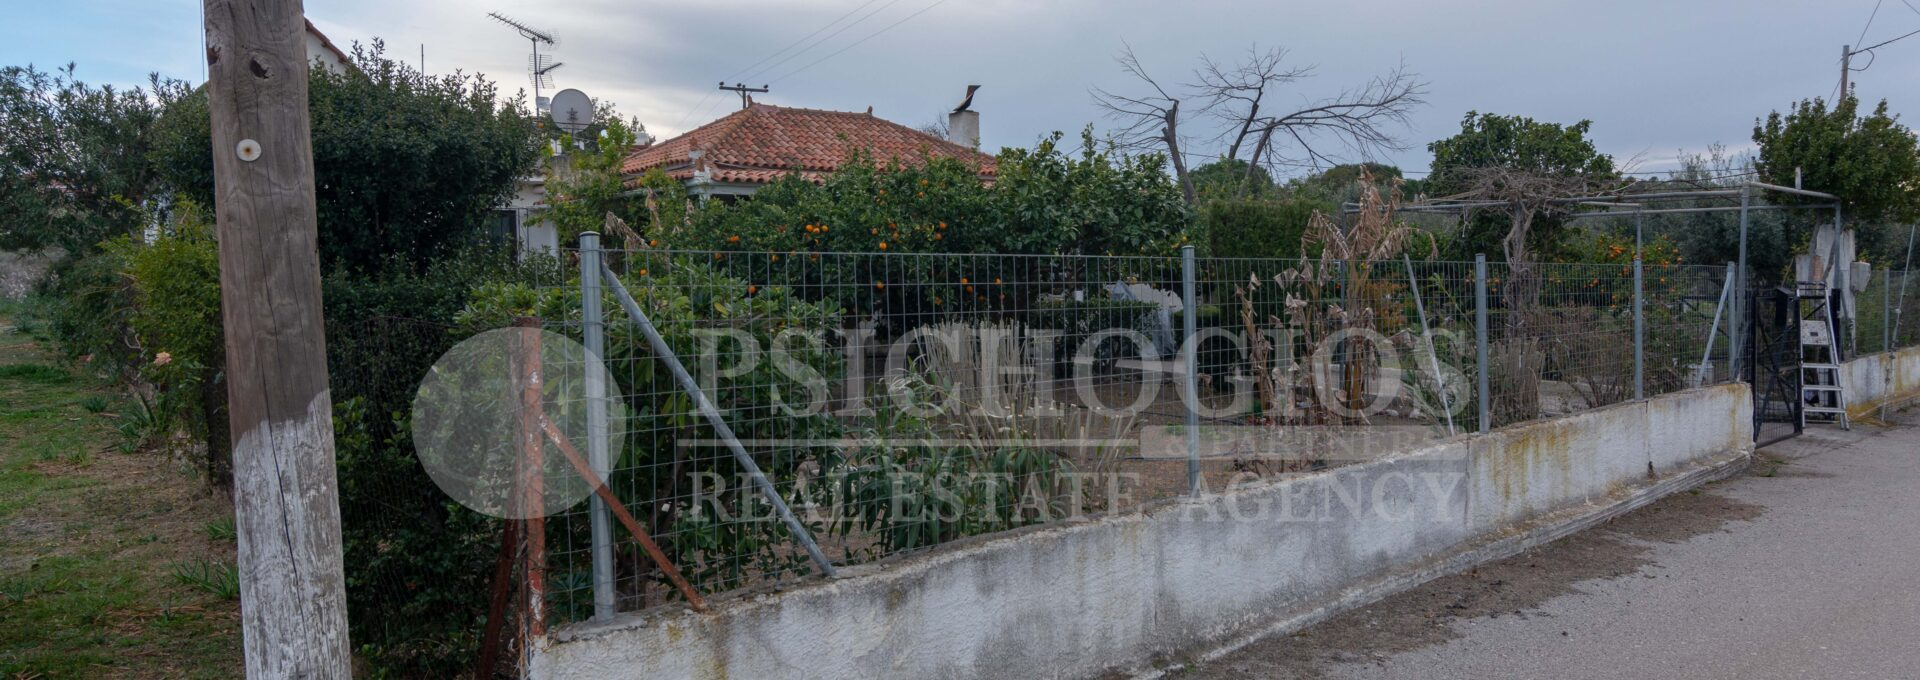 for_sale_two_houses_plot_2000_sq.m._view_ermioni_greece 1 (12)